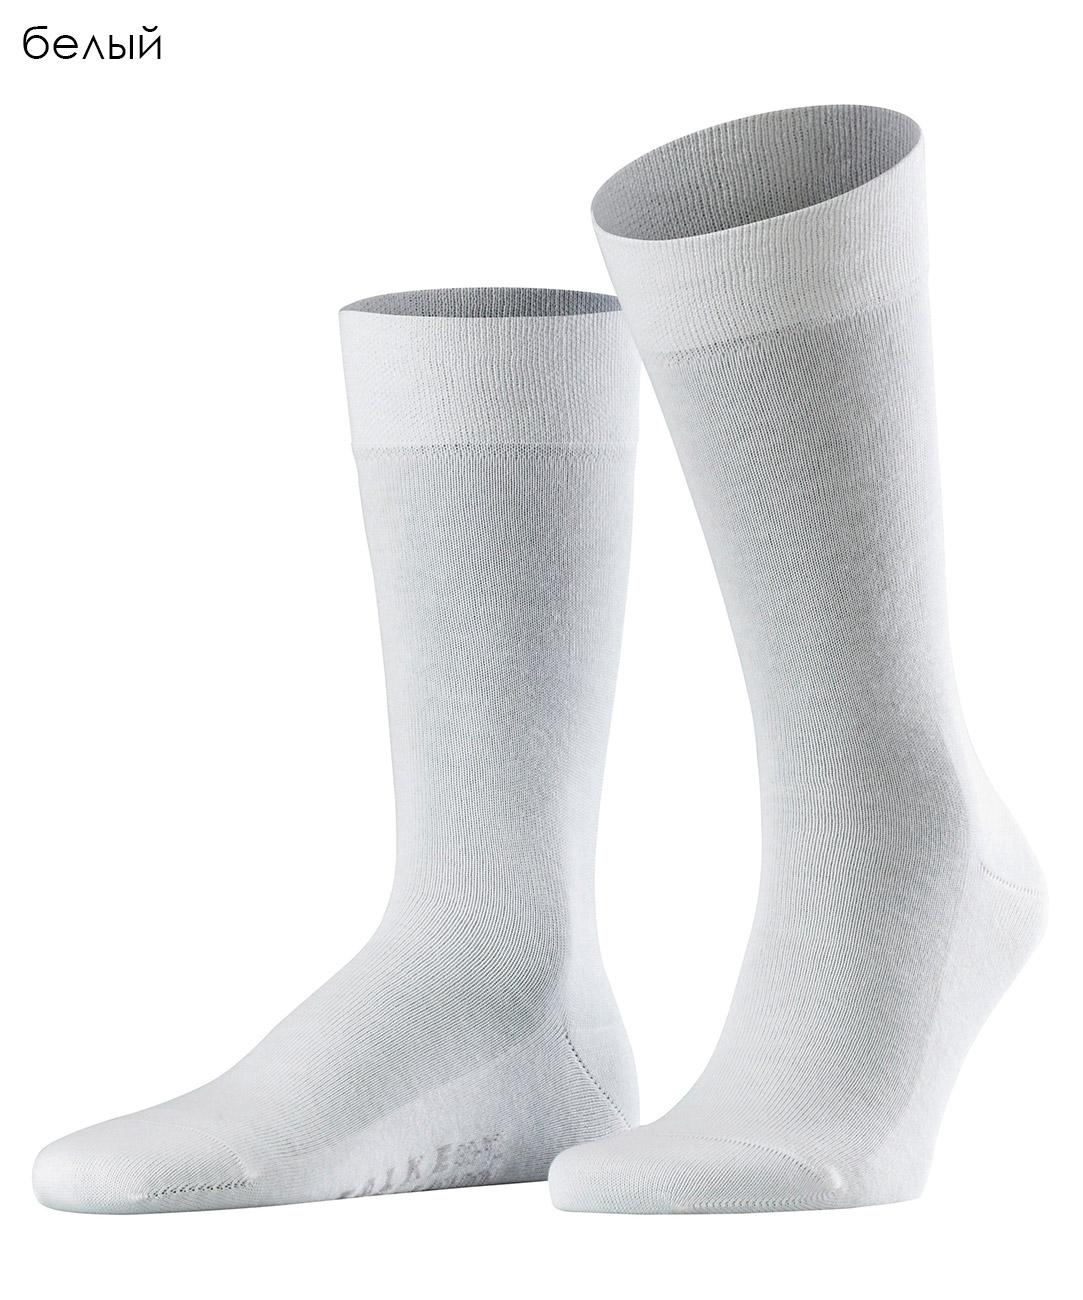 Мужские носки 14616 Sensitive London Falke